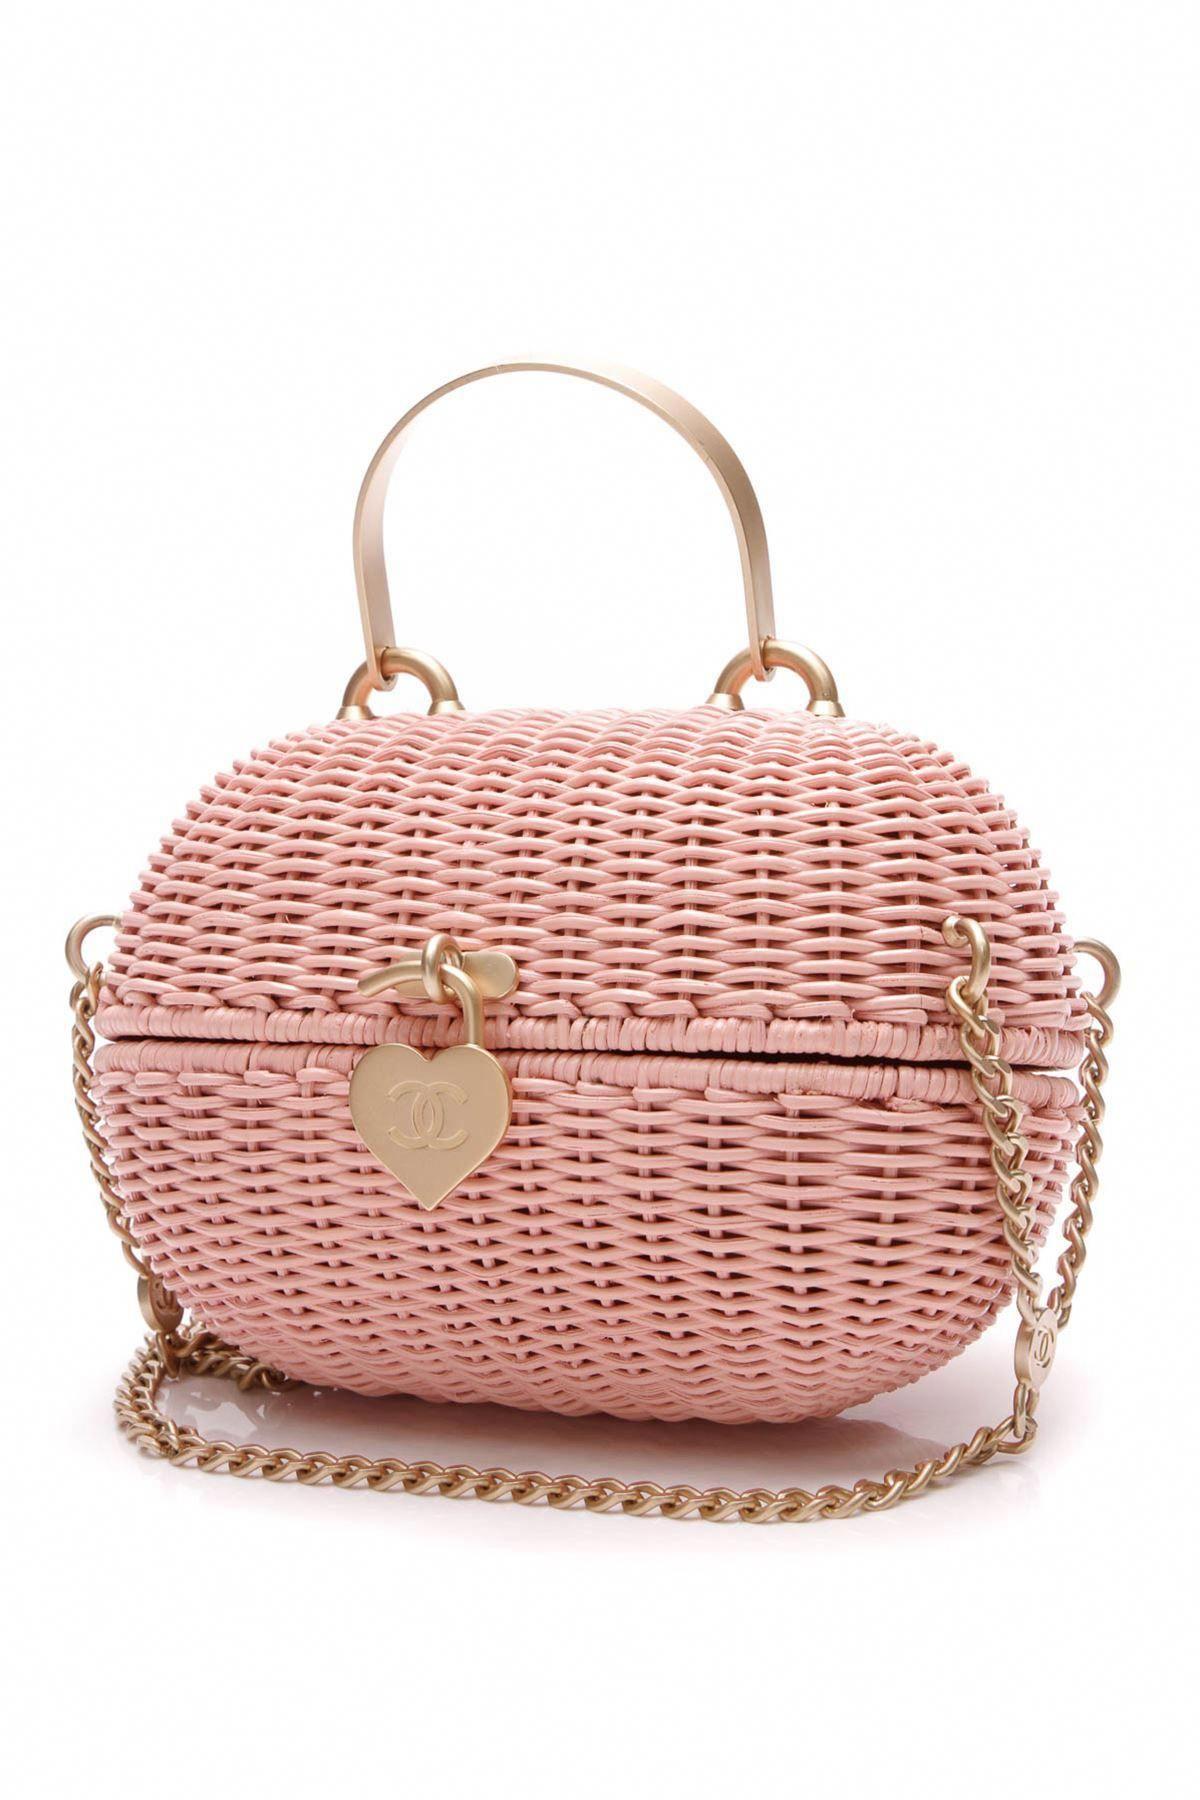 04ddd3e5c4ef Chanel Heart Closure Basket Bag - Pink   36441 #Chanelhandbags ...